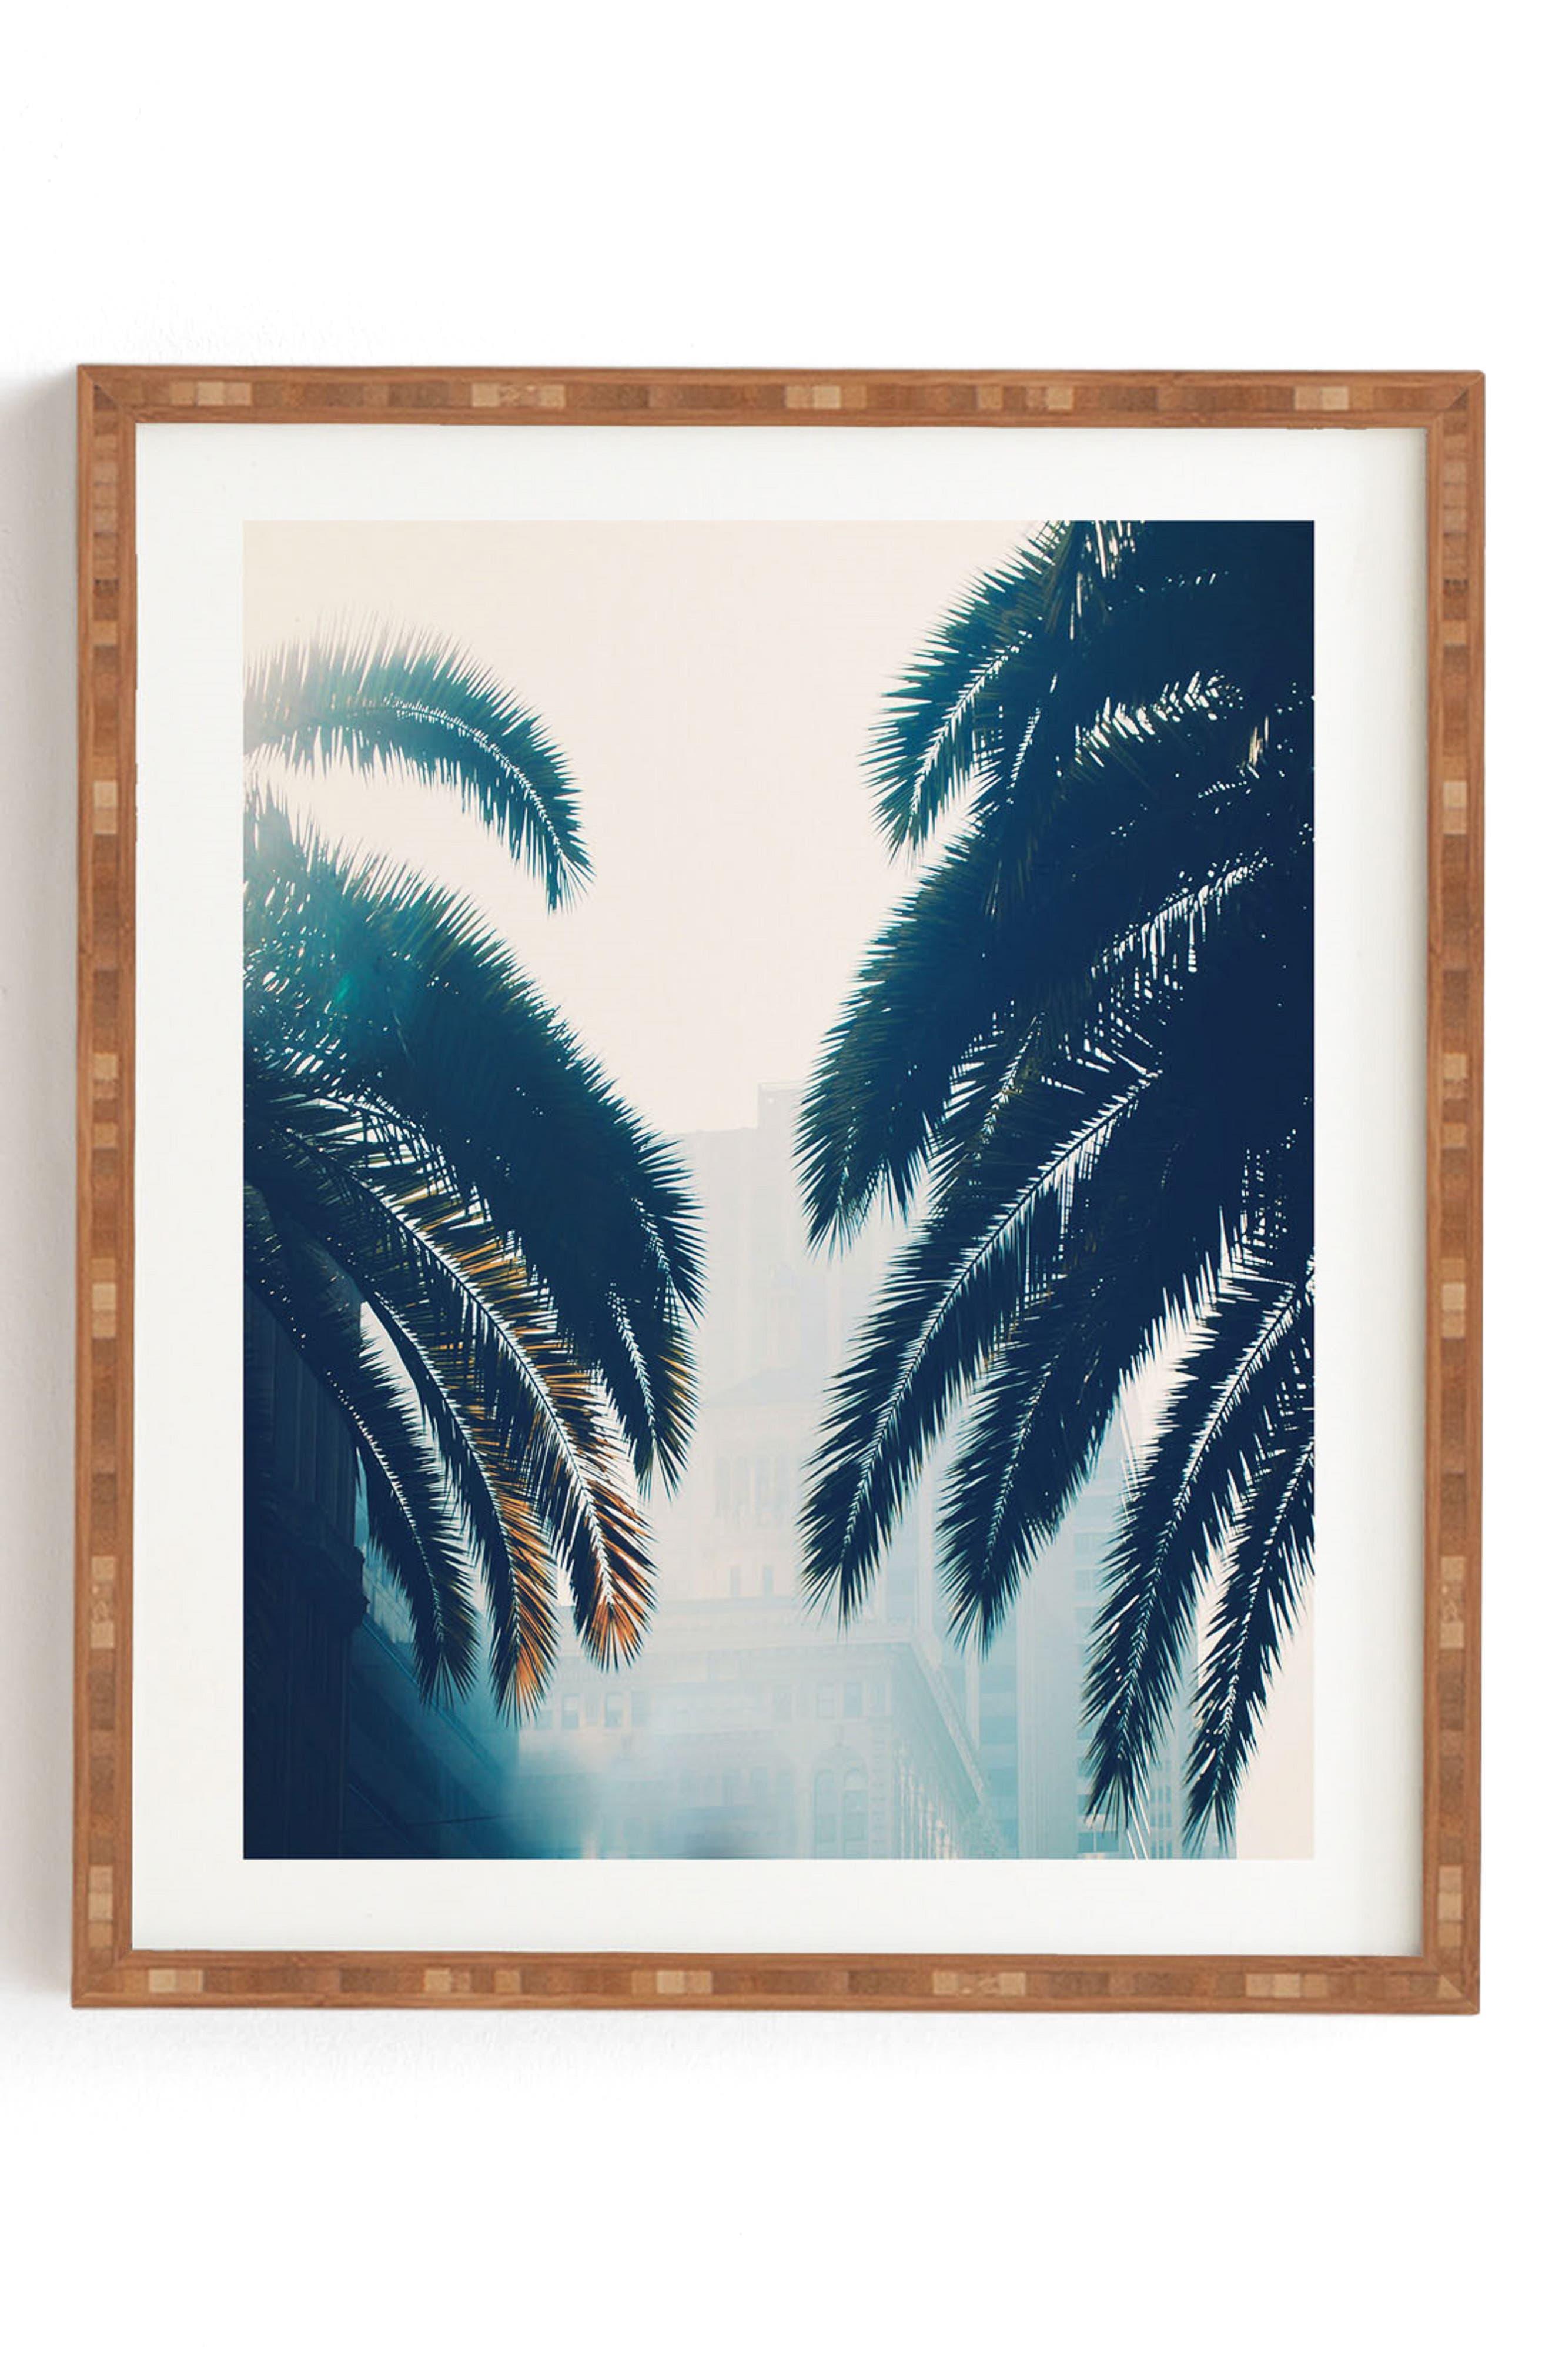 DENY DESIGNS Chelsea Victoria - California Blue Framed Wall Art, Main, color, BLUE